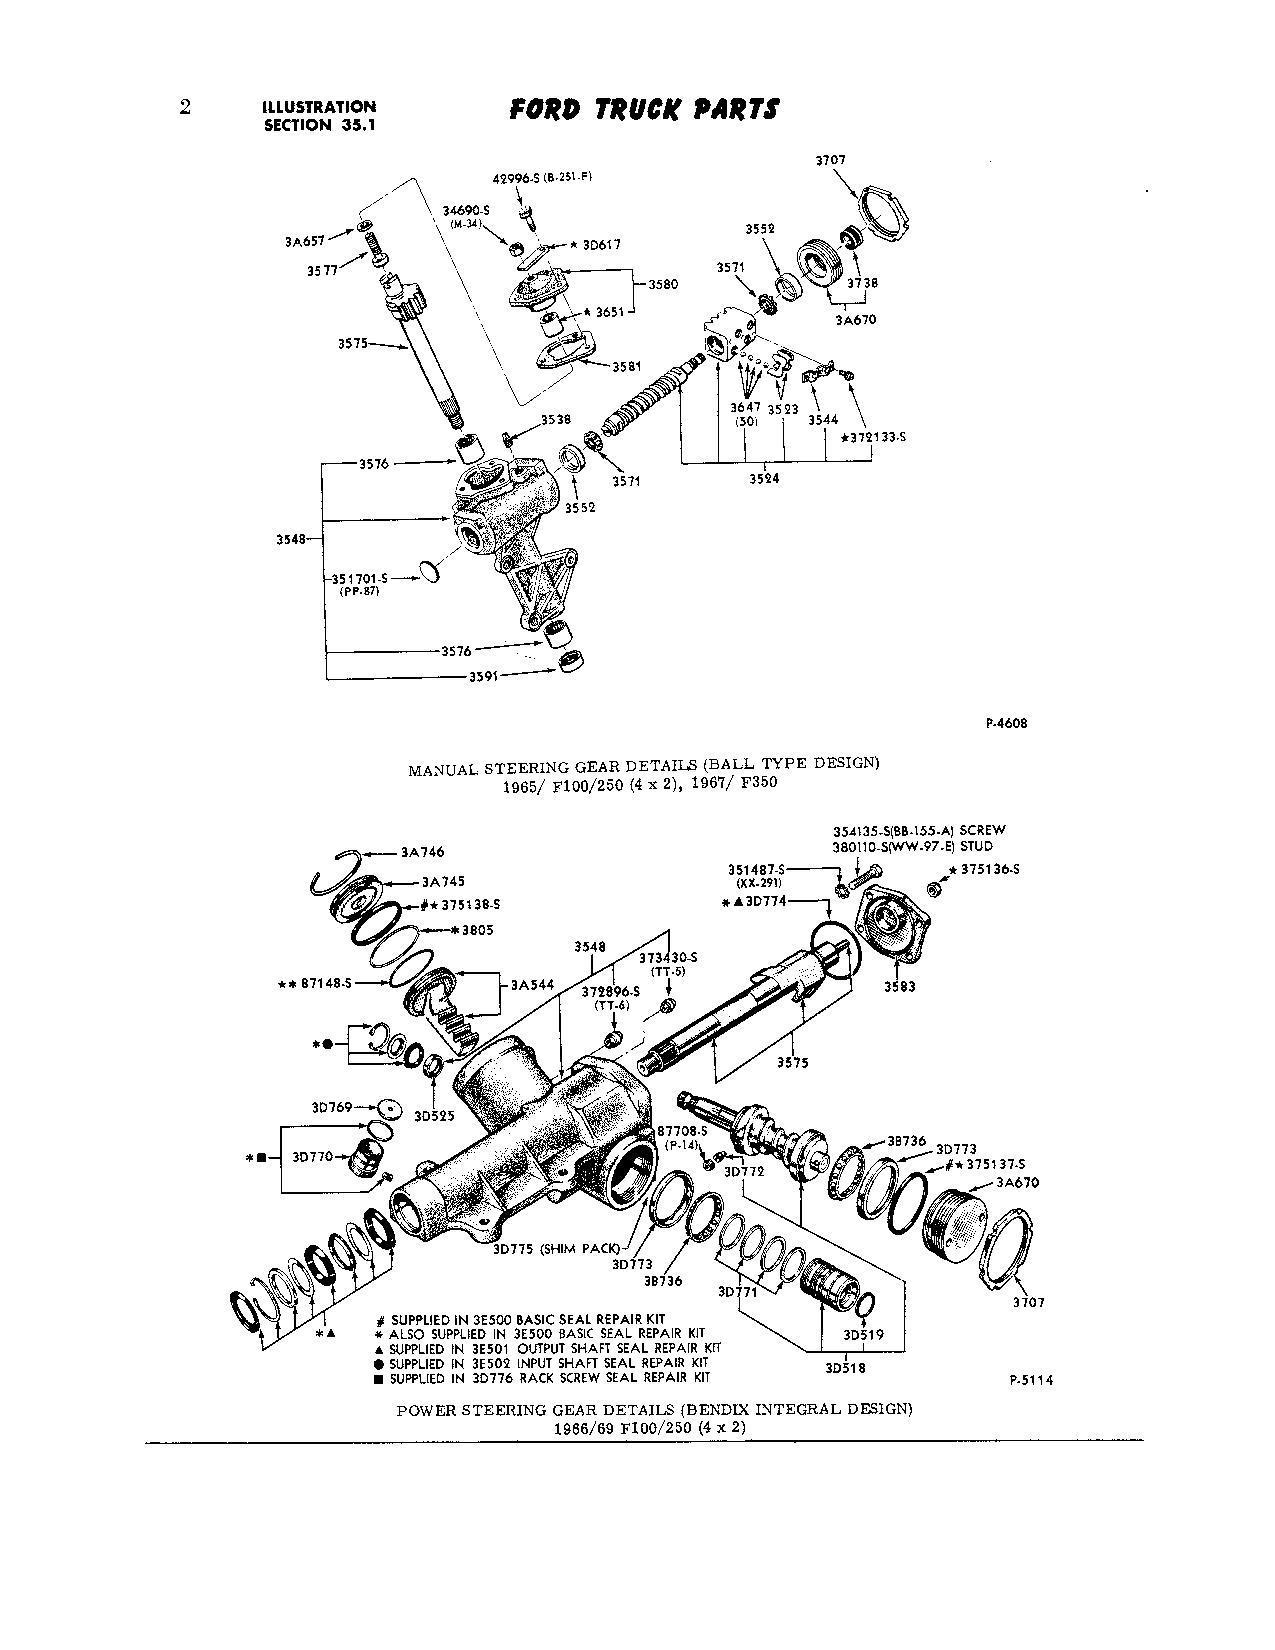 F250 Bendix Power Steering Gearbox Is Driving Me